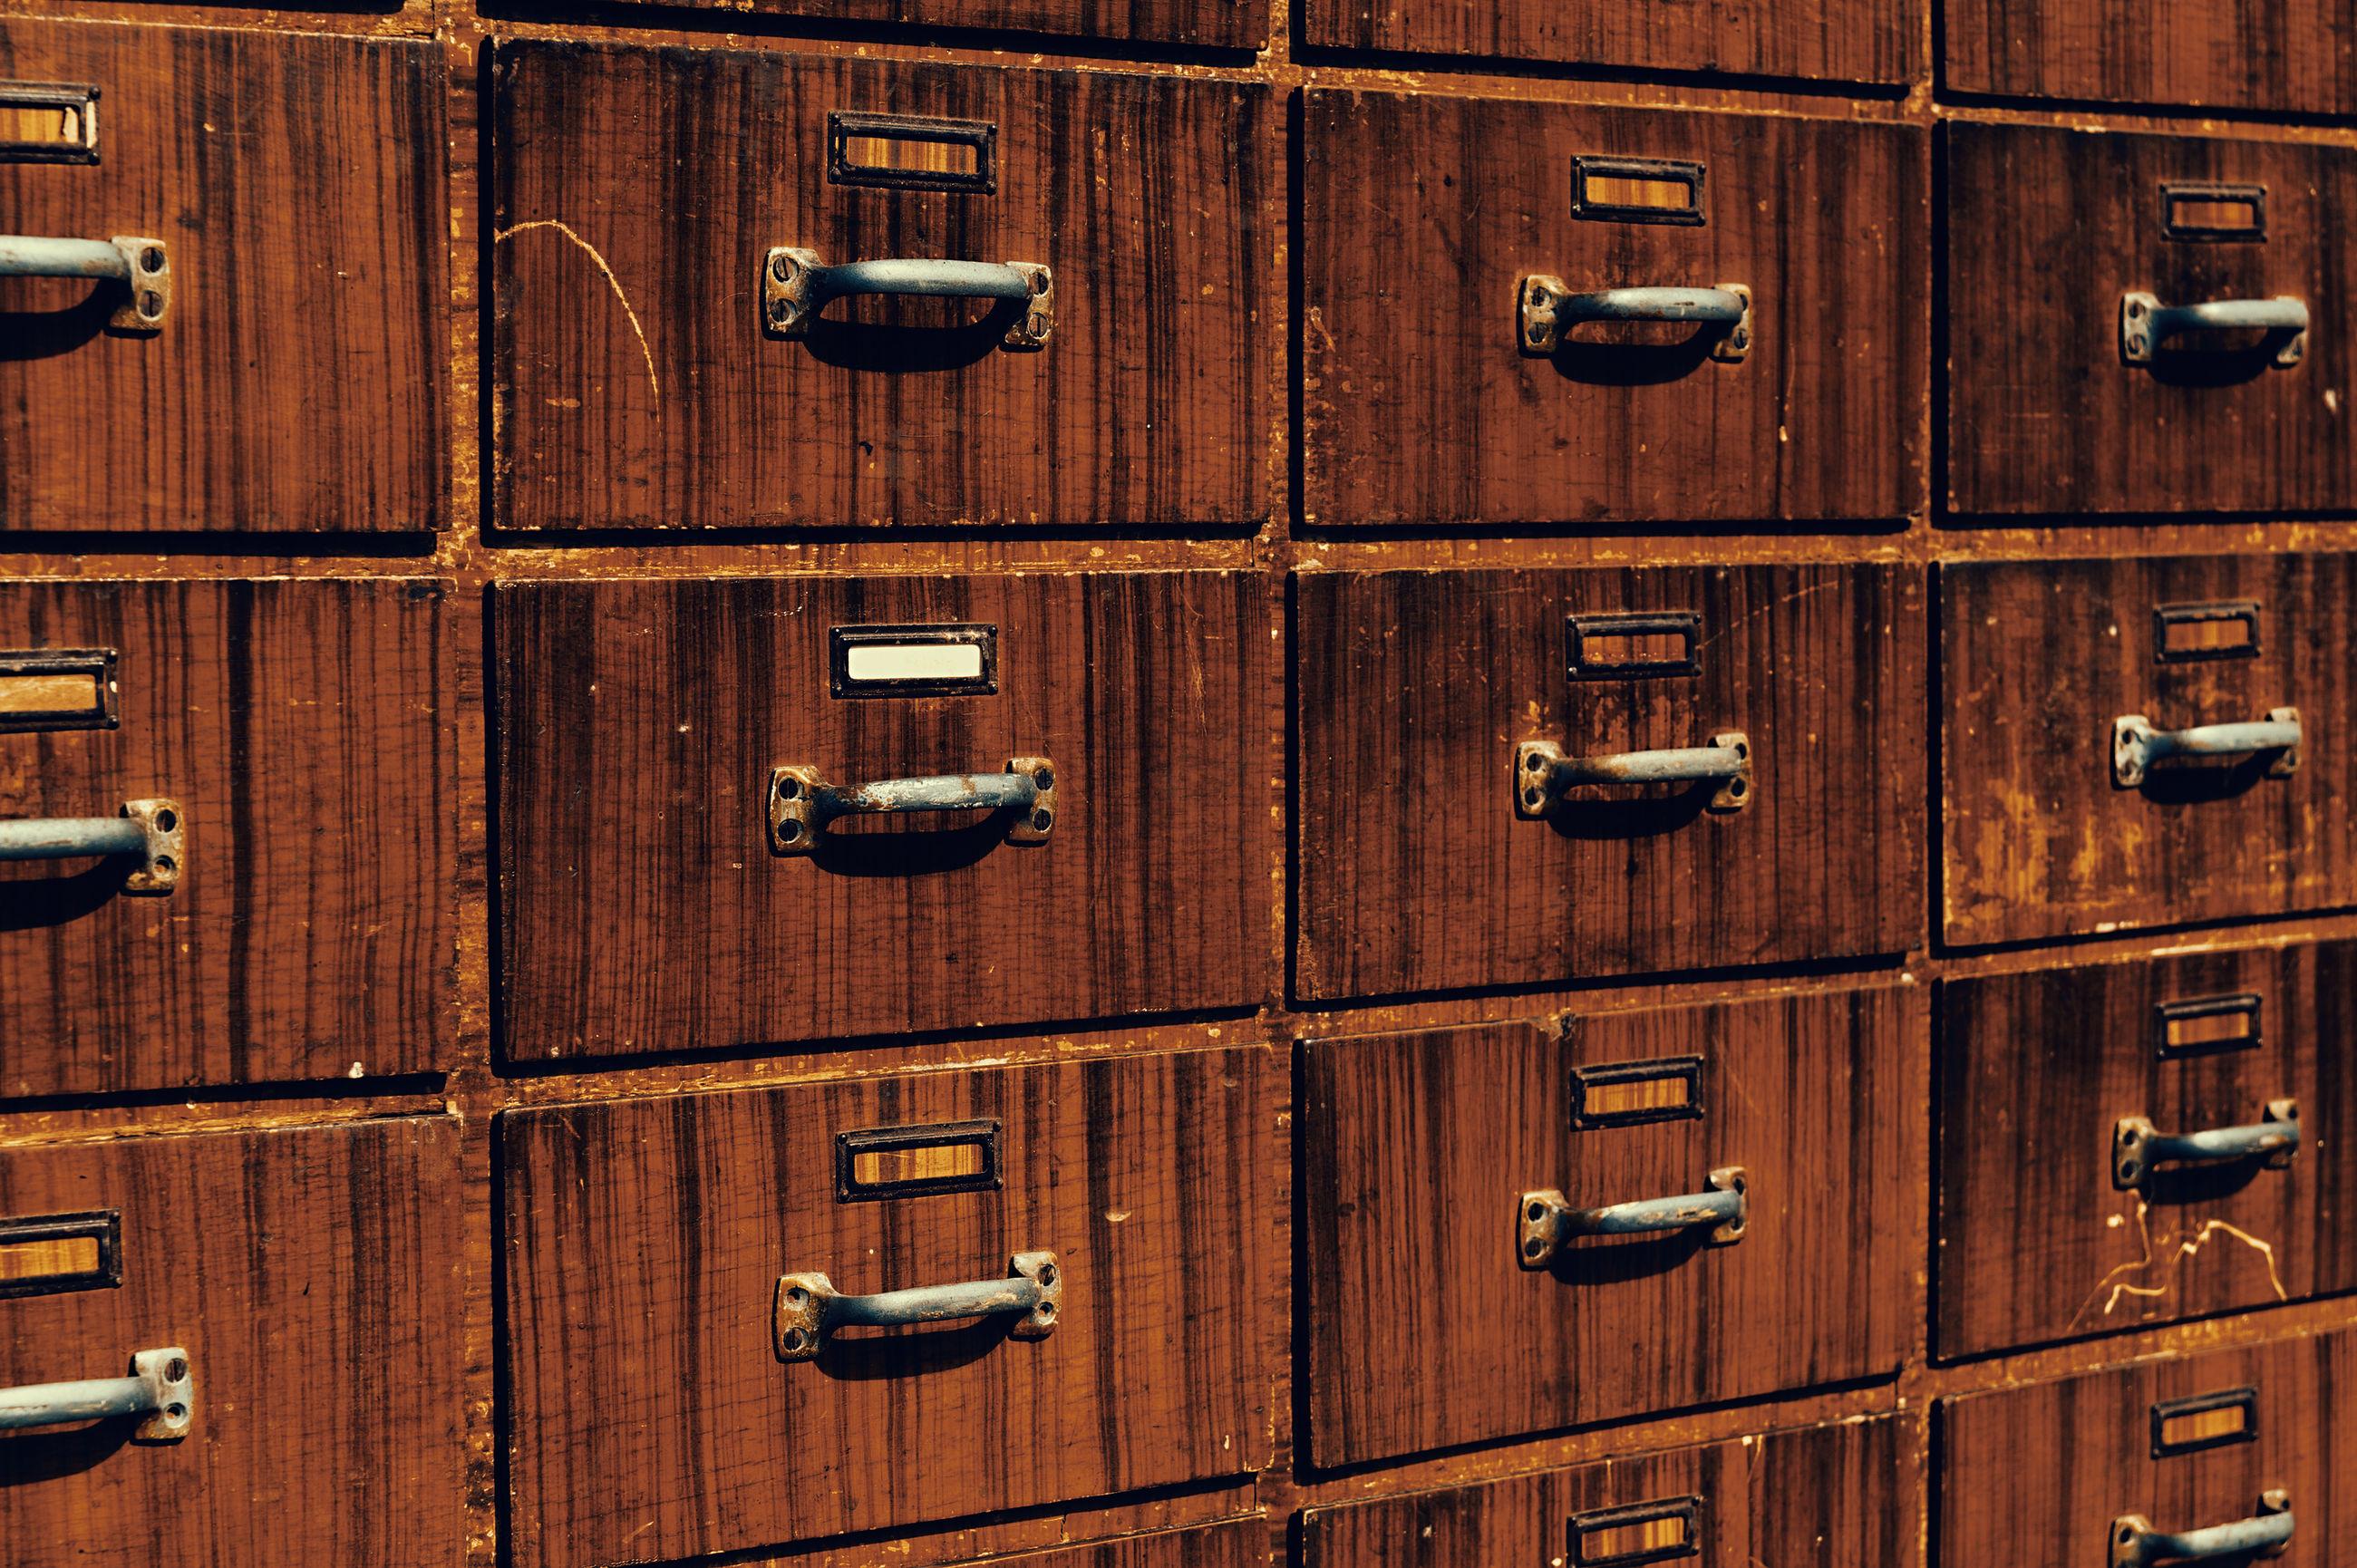 Full frame shot of wooden cabinet